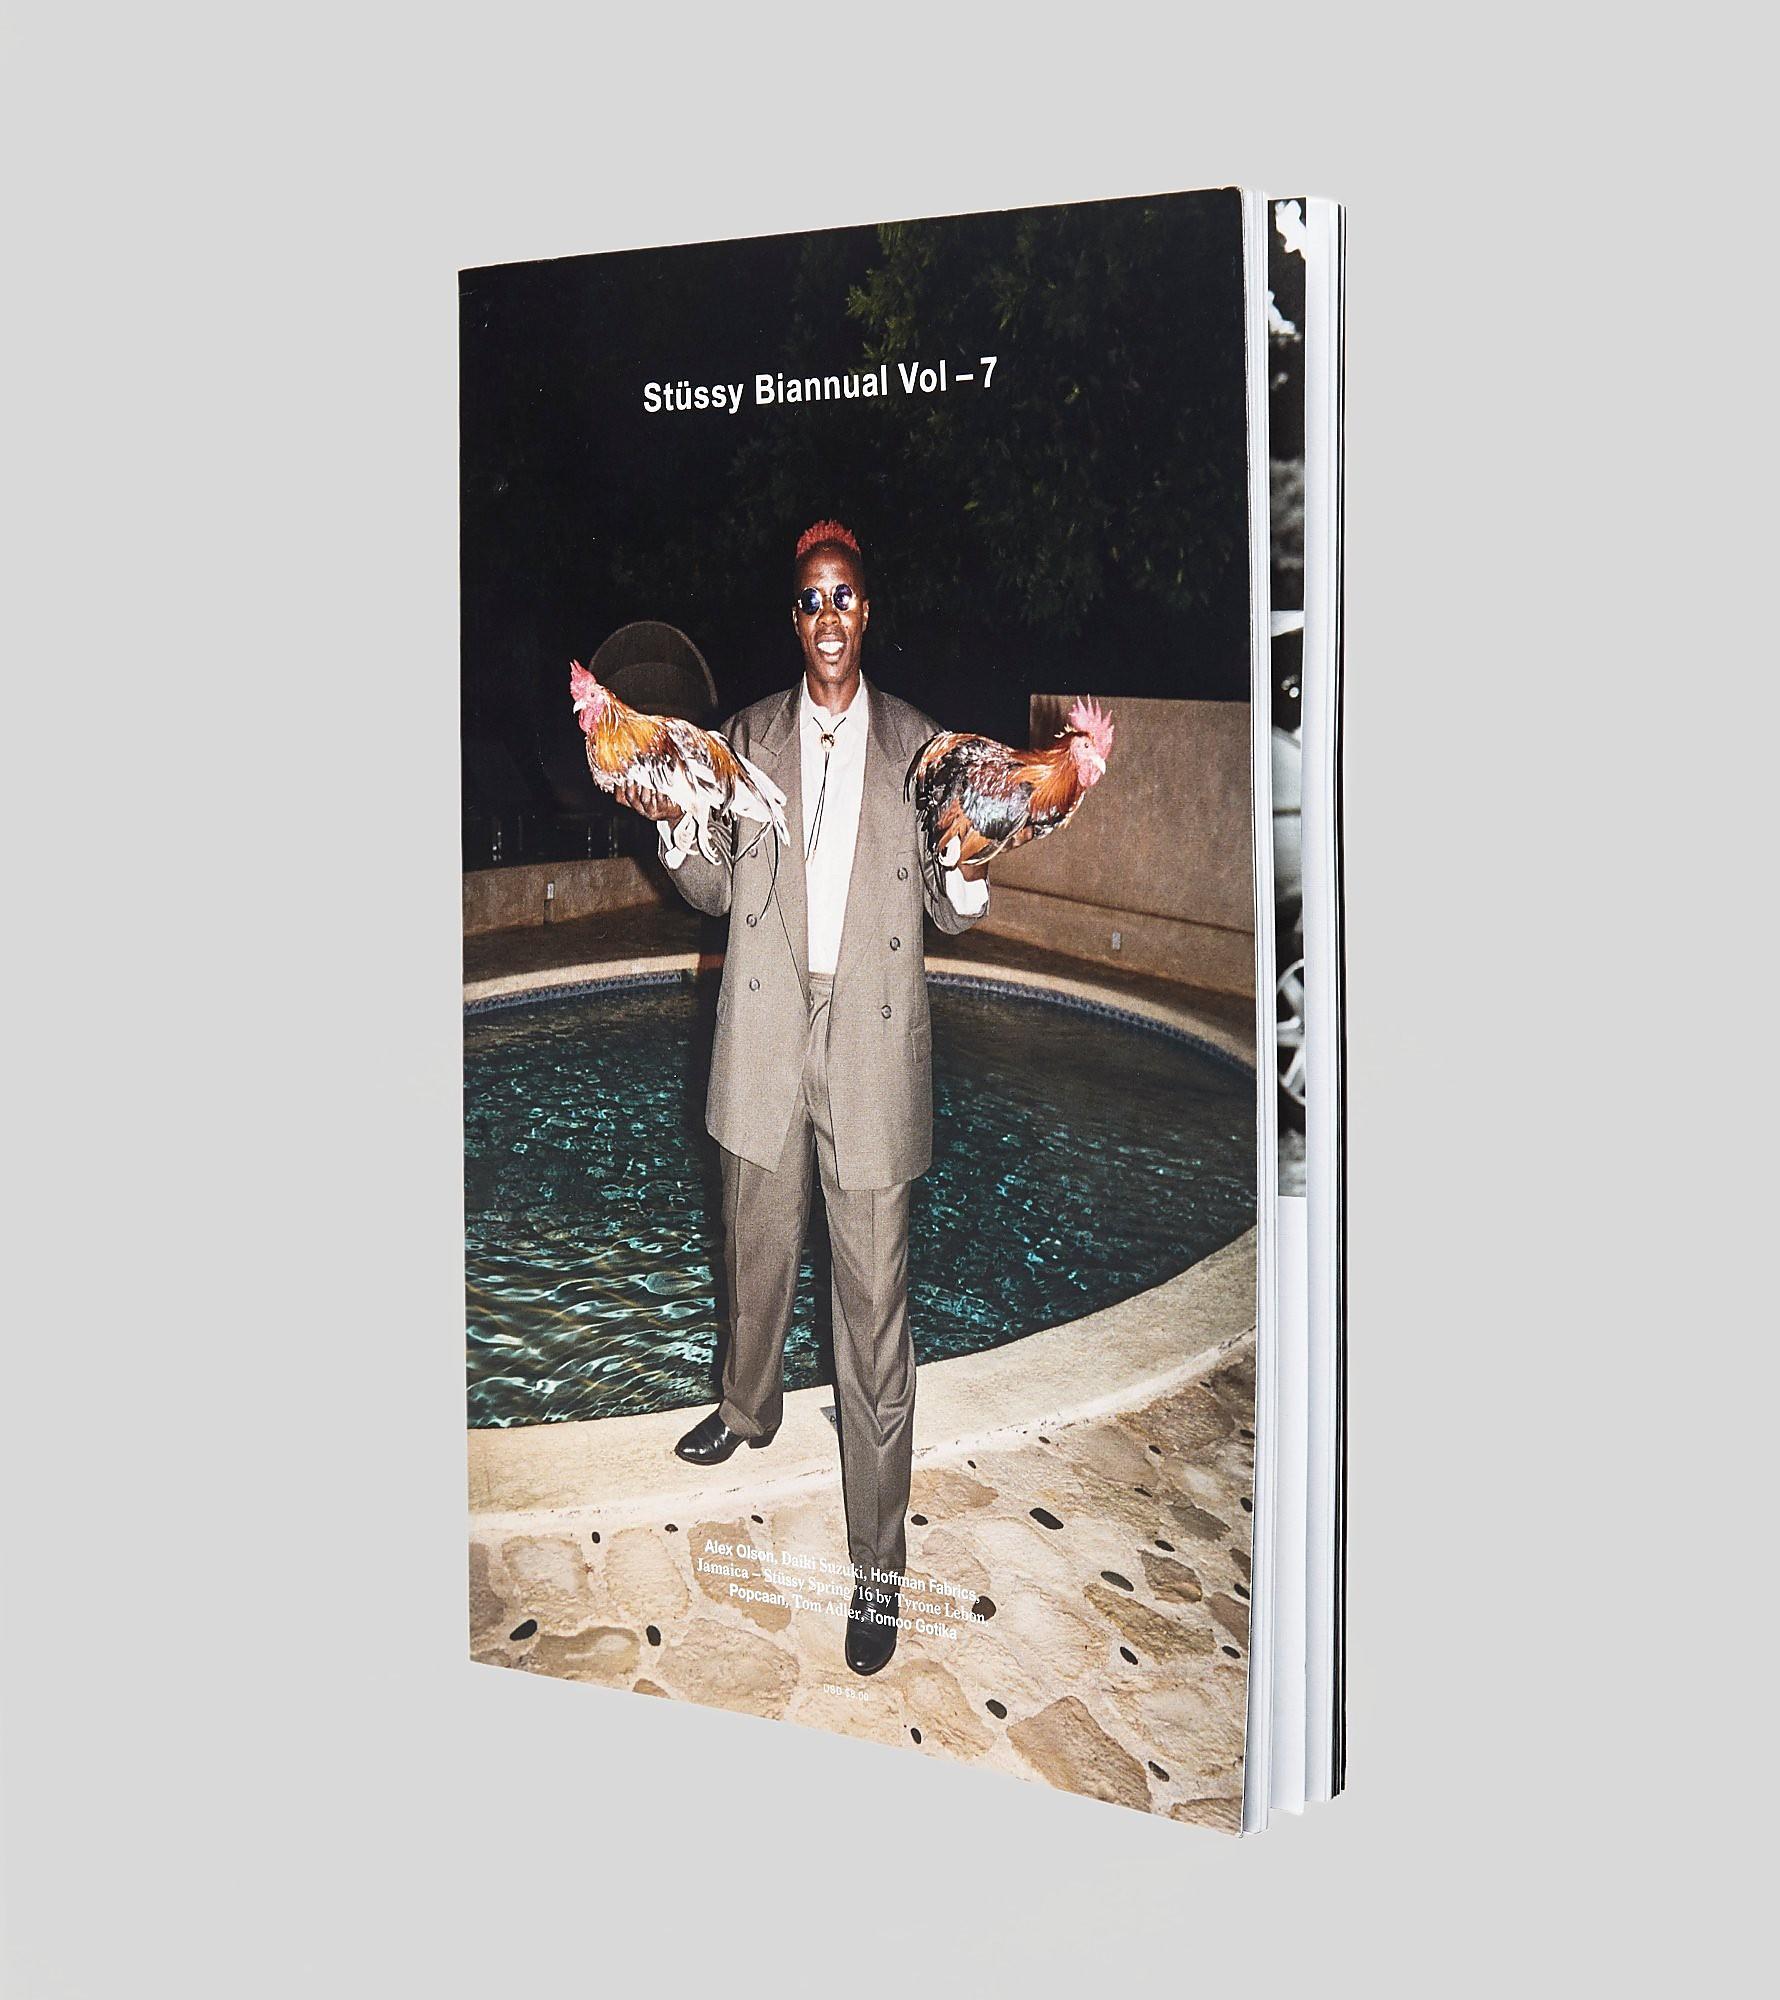 Stussy Biannual Vol. 7